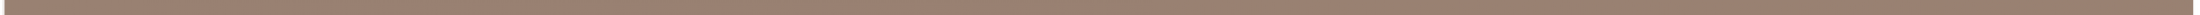 brown-bar